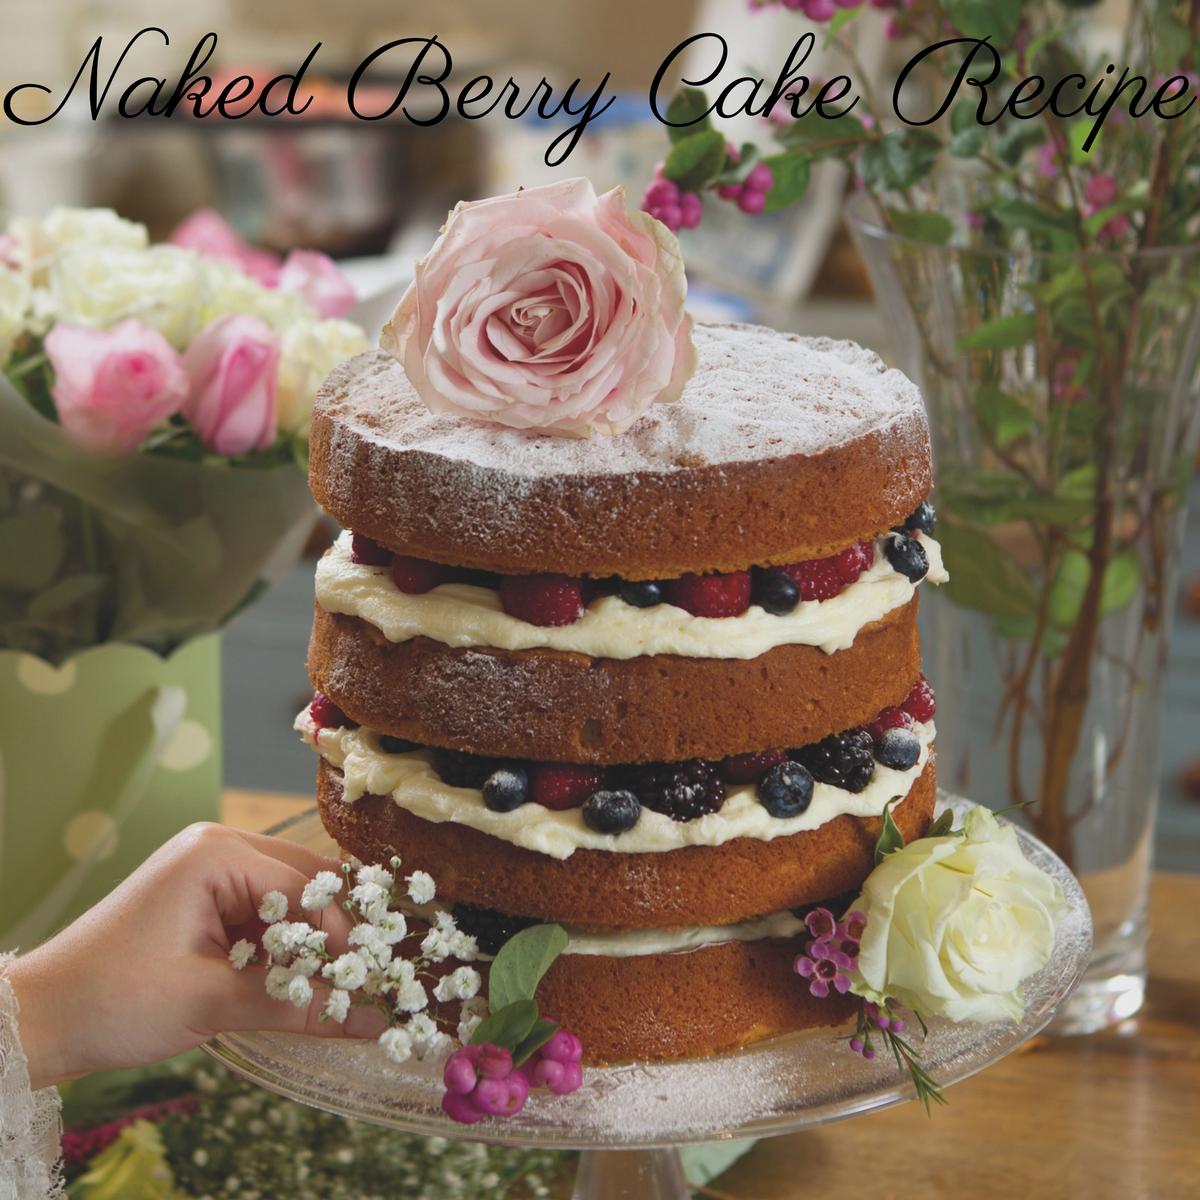 Naked Berry Cake Recipe